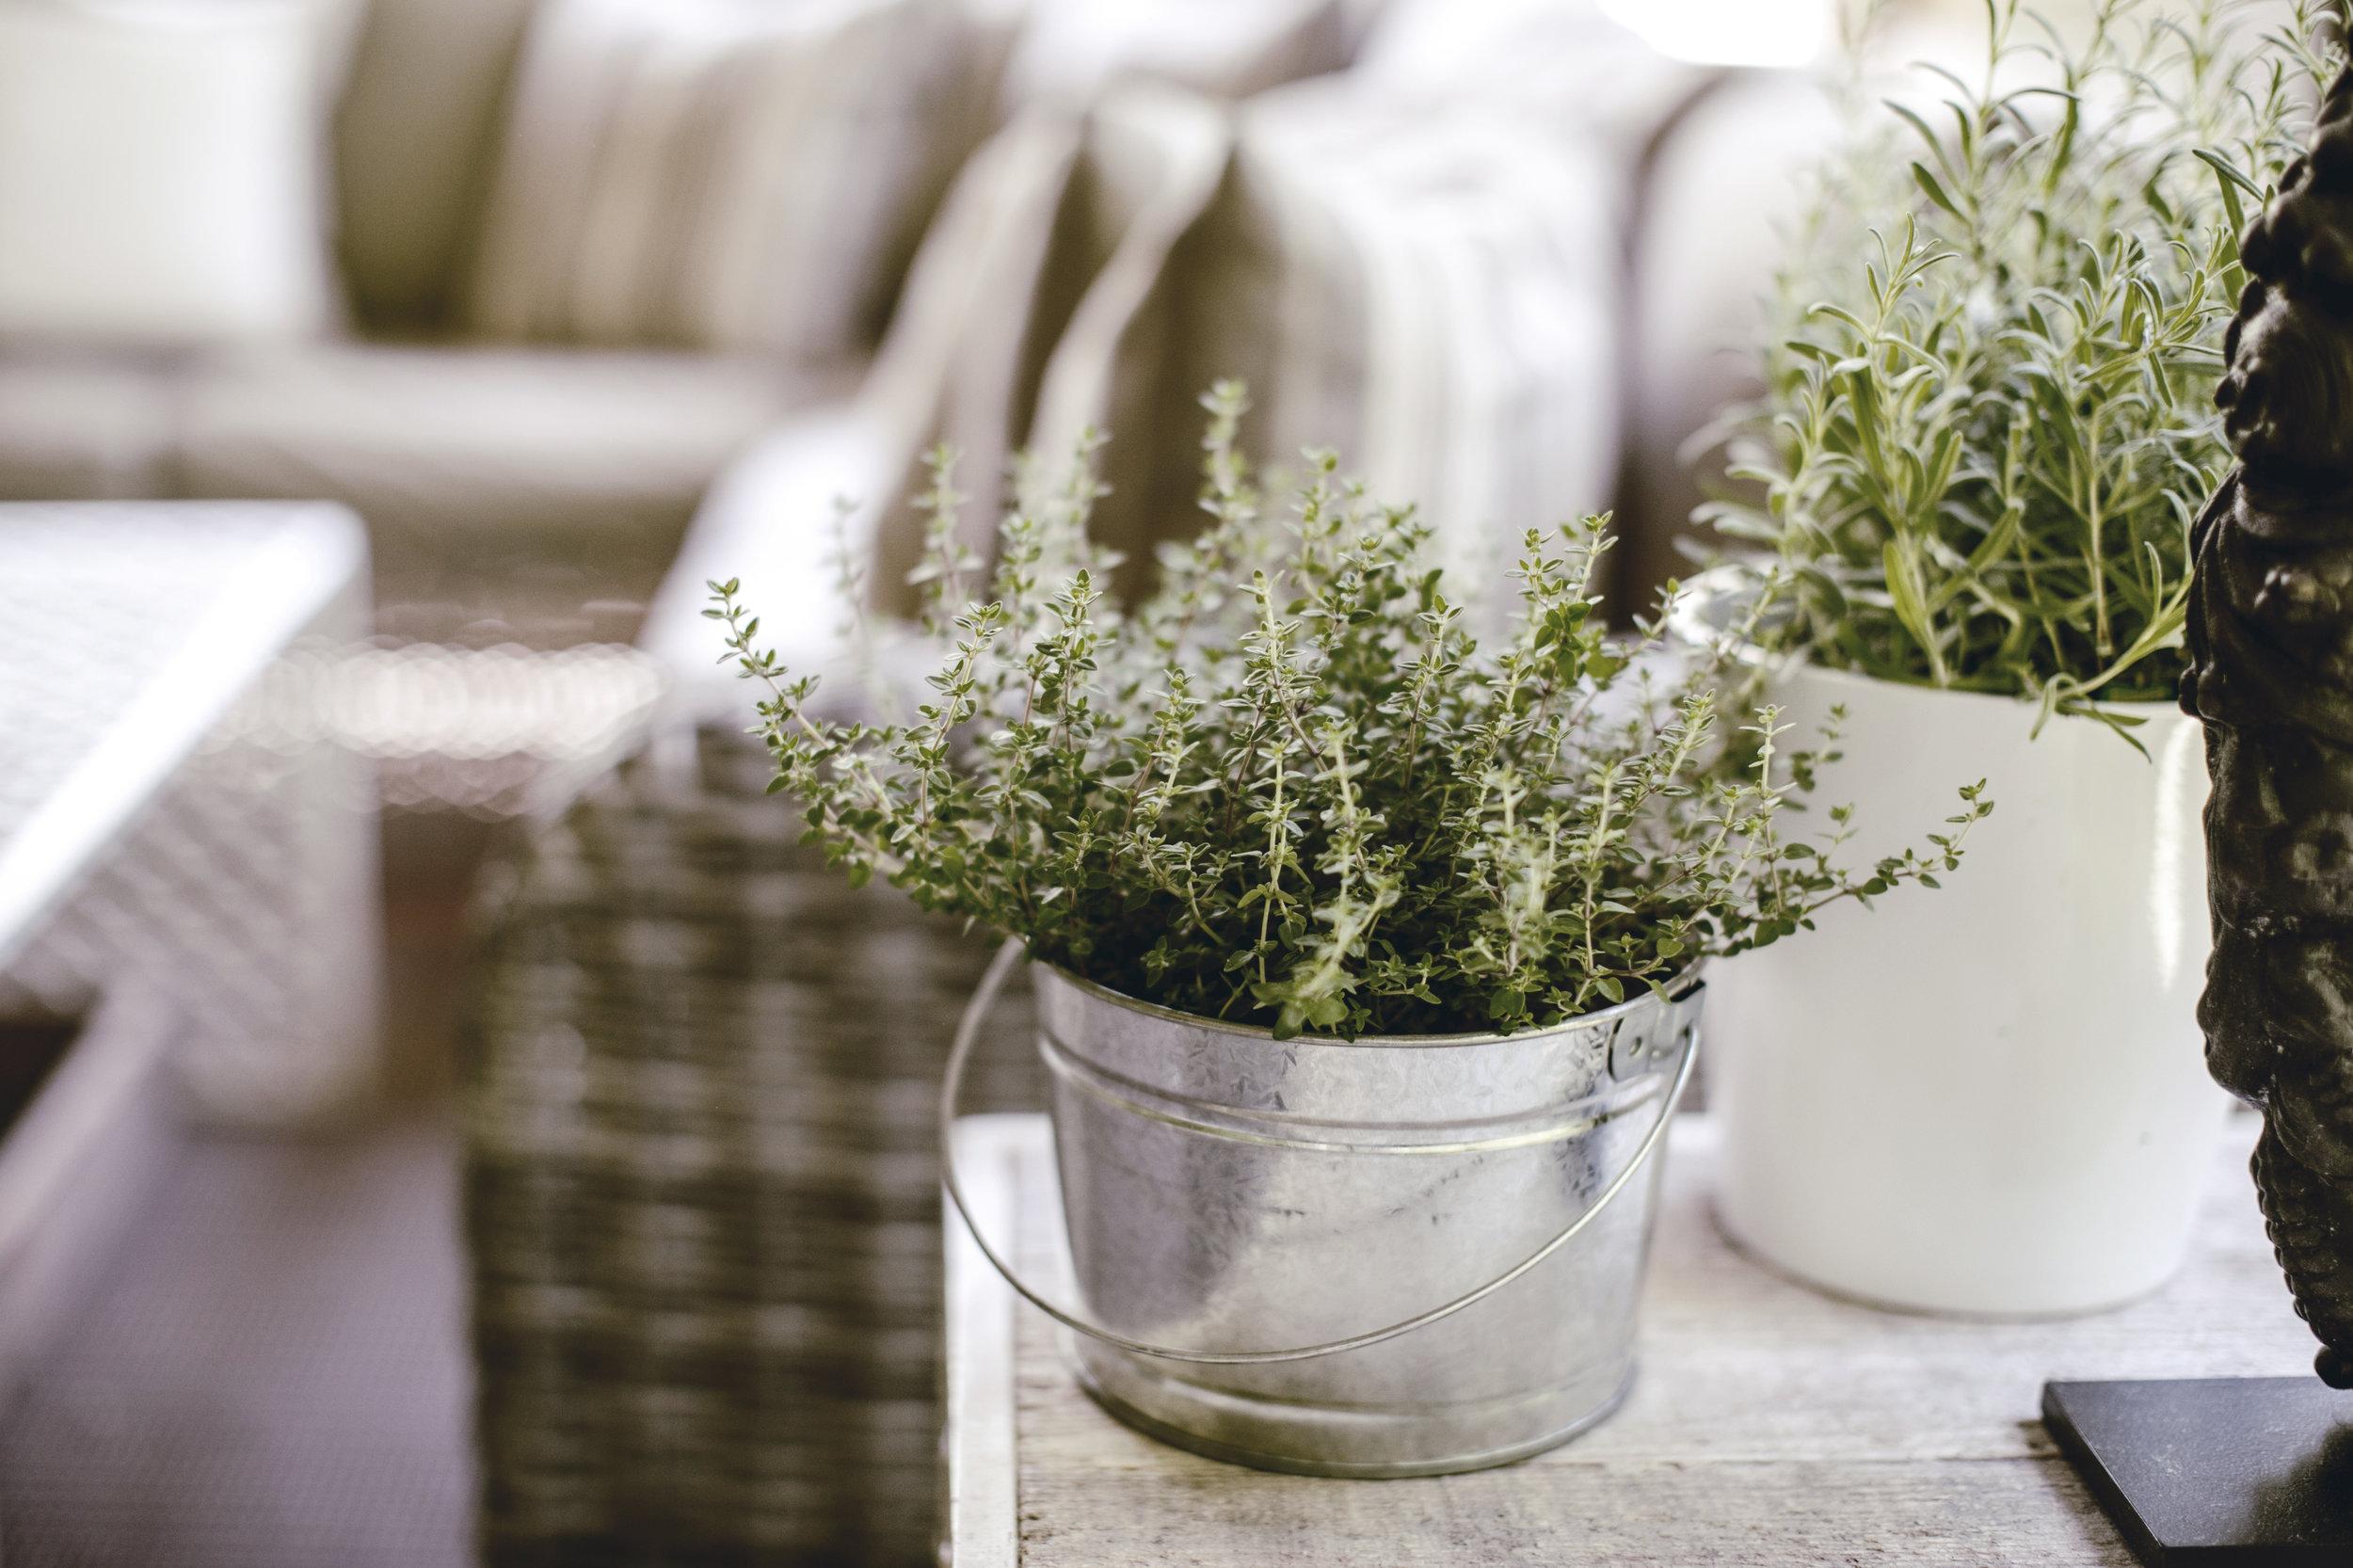 outdoor patio kitchen herbs / heirloomed